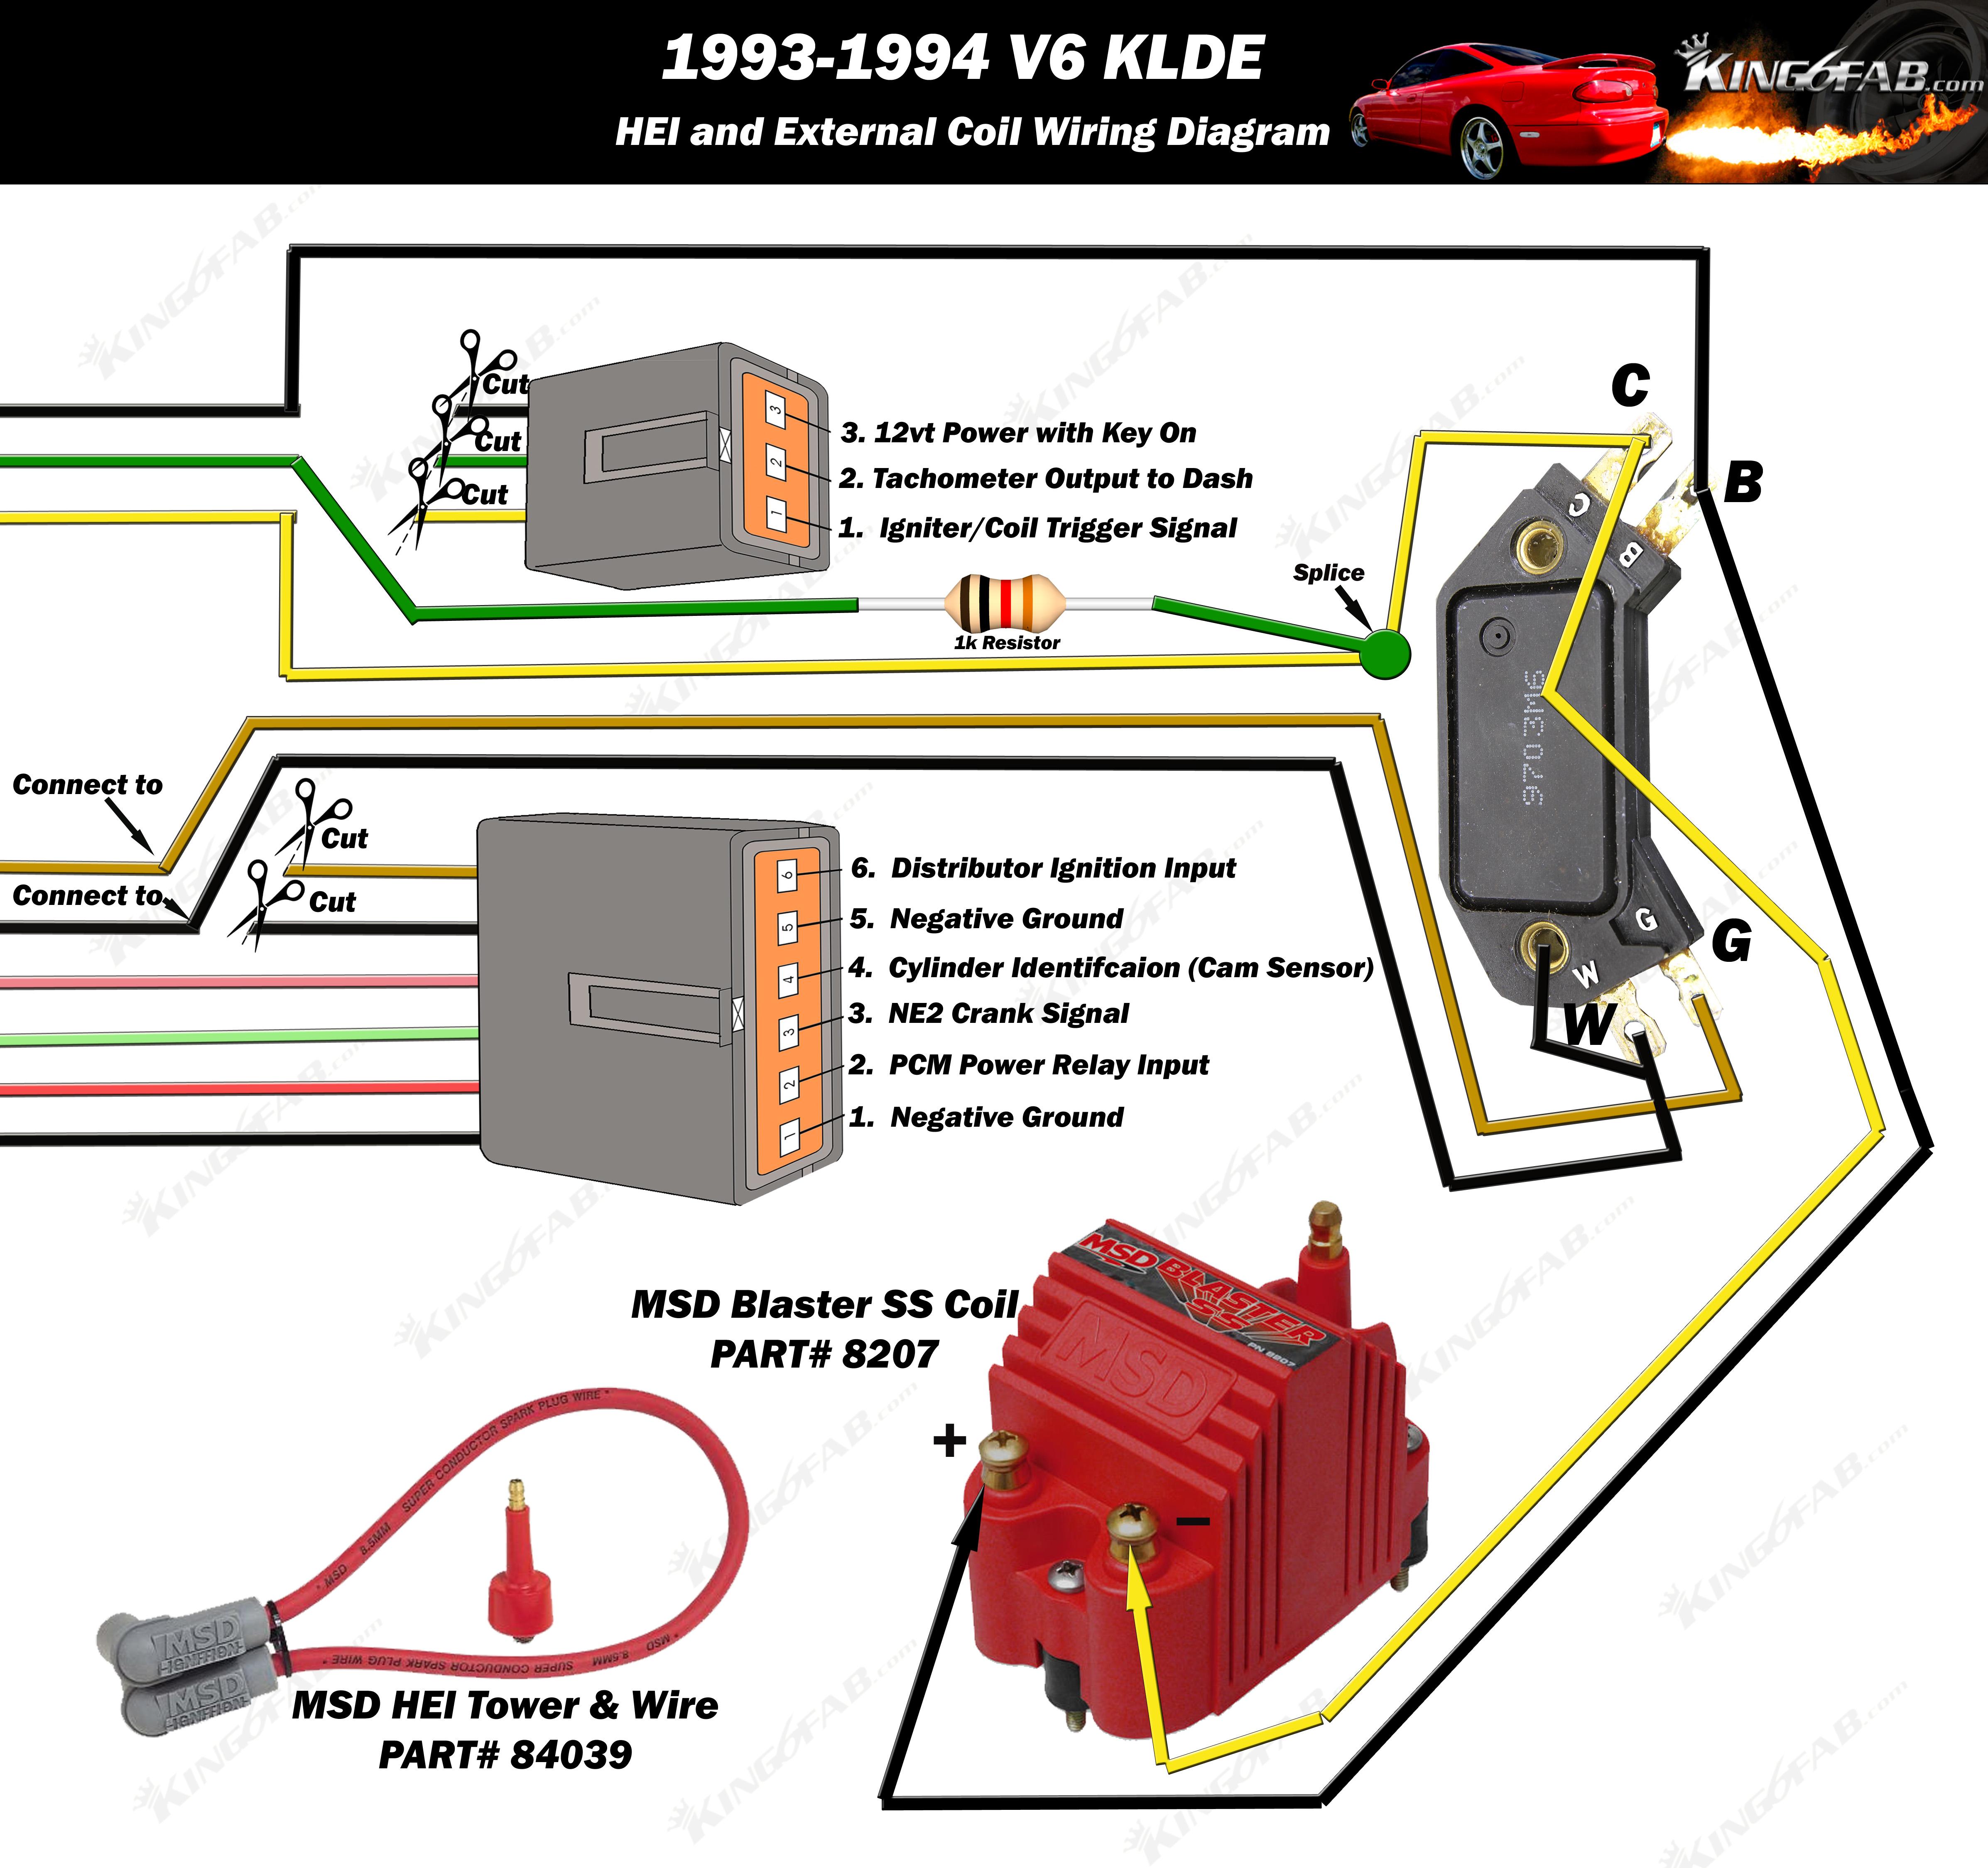 Mazda 626 Distributor Wiring Diagram Wiring Diagram Bundle Browse A Bundle Browse A Bowlingronta It